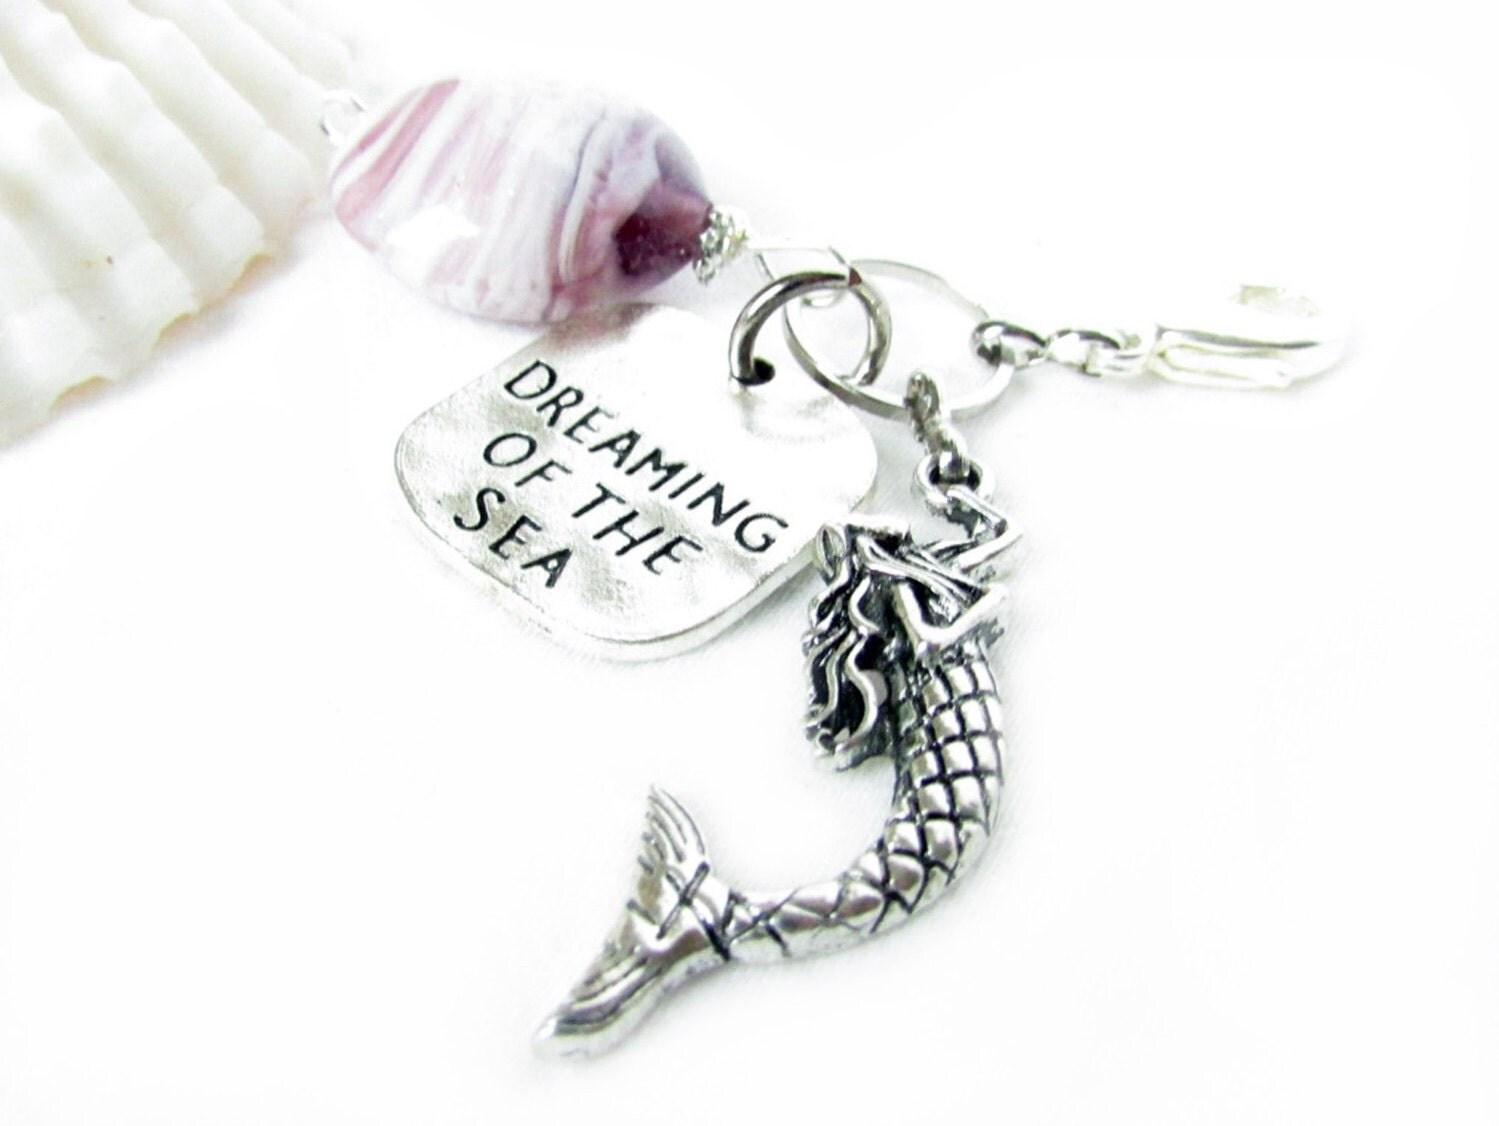 zipper pull zipper charm handbag charm purse charm mermaid